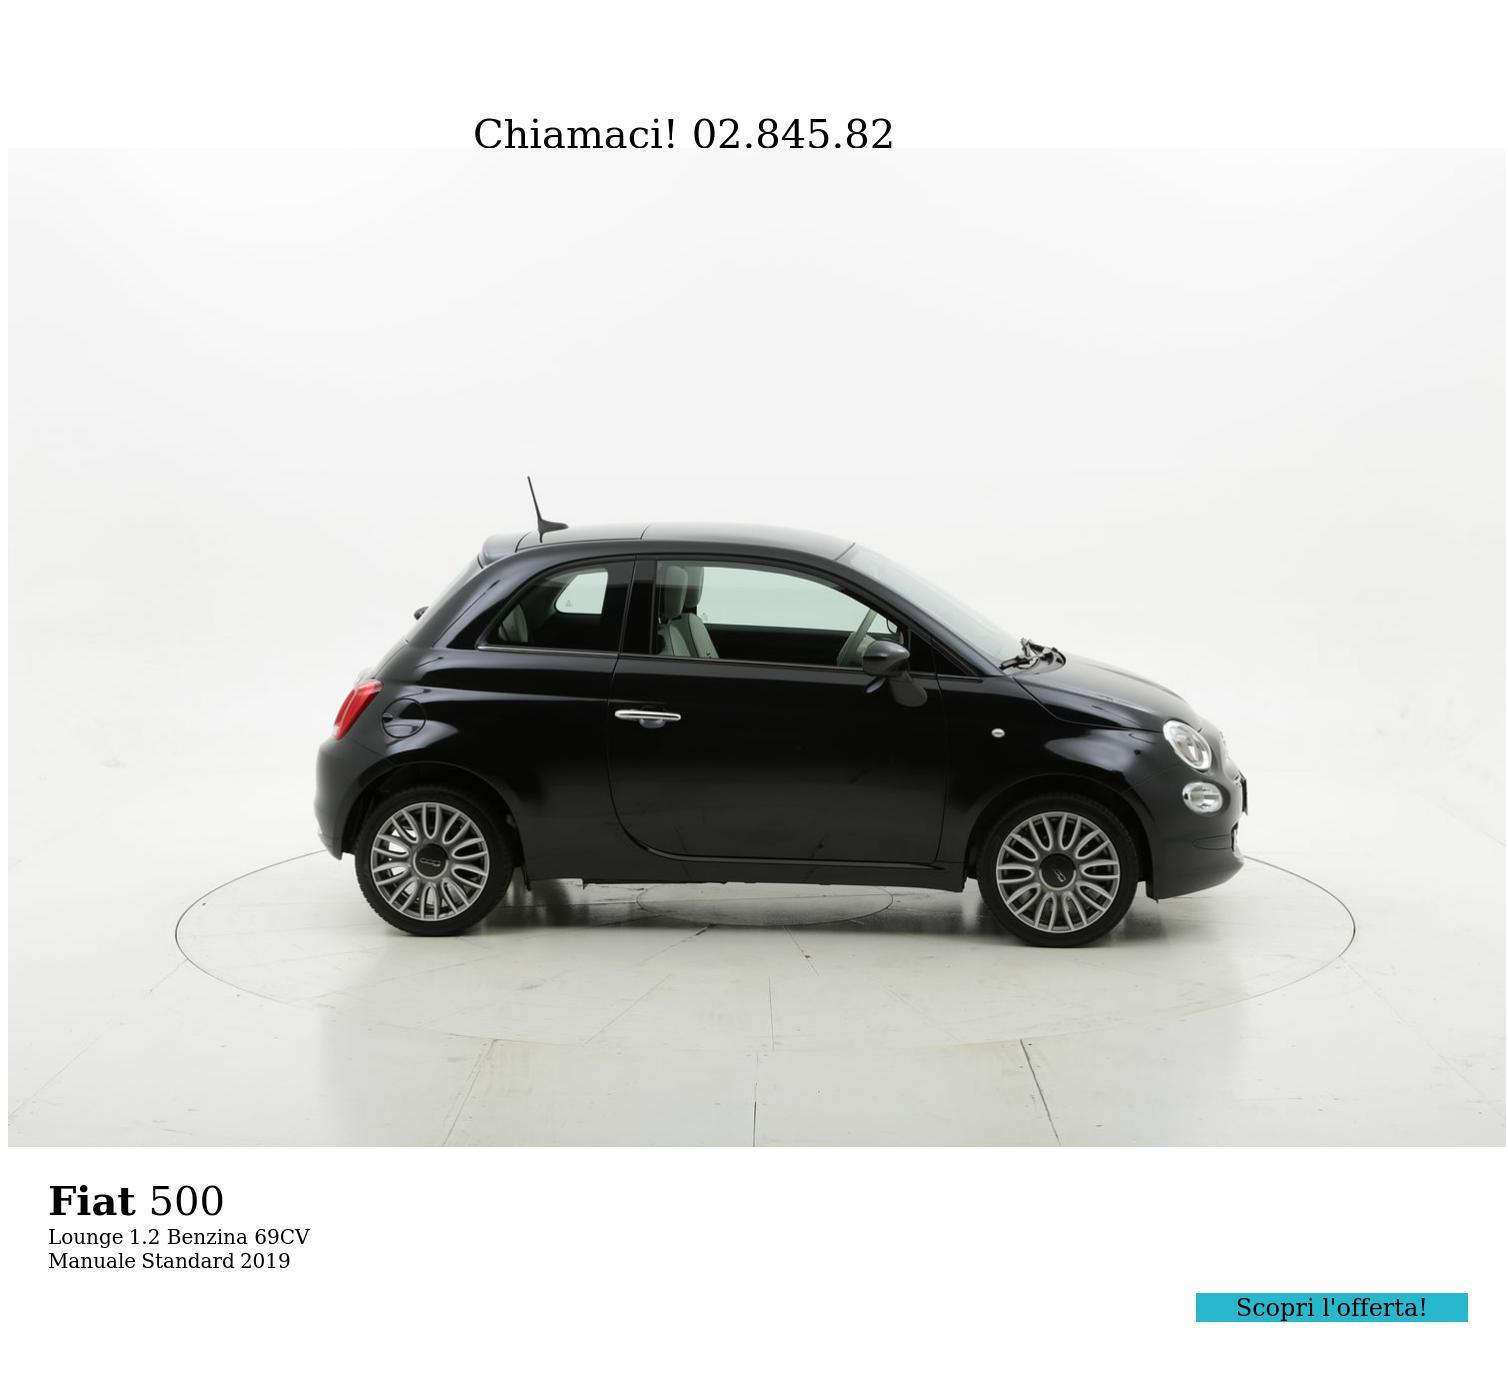 Fiat 500 Lounge km 0 benzina nera | brumbrum